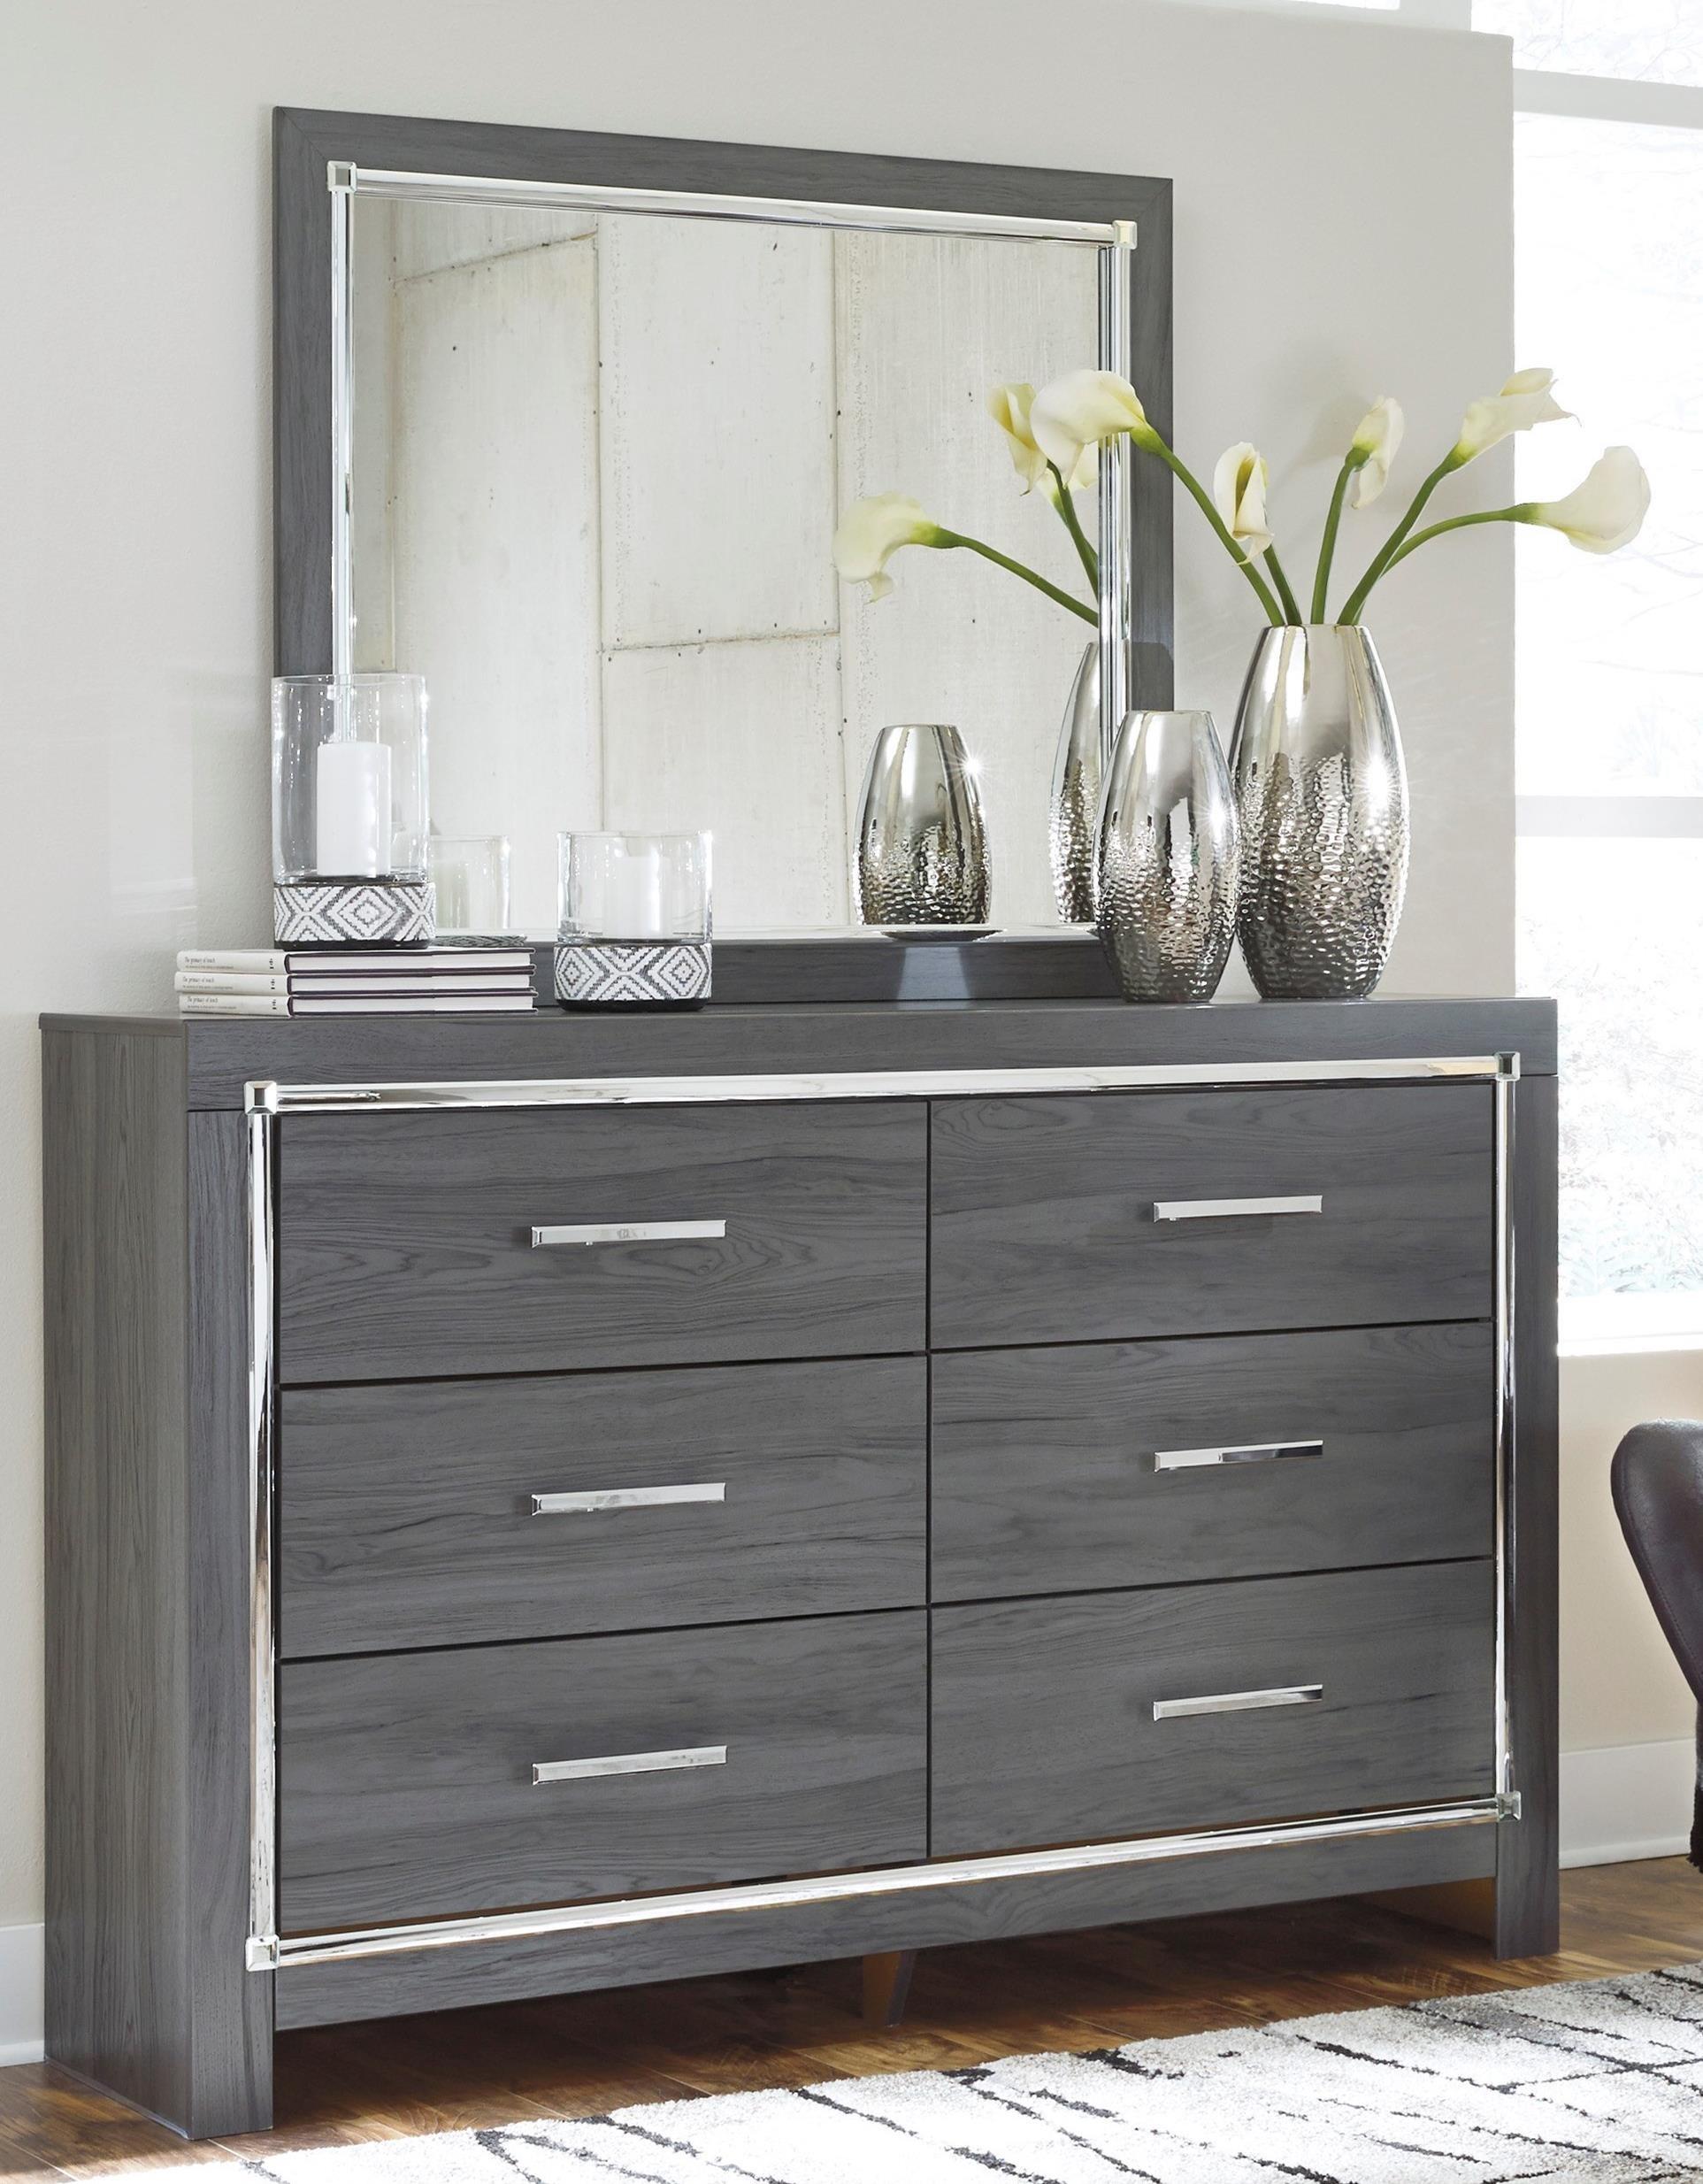 Lodana Dresser and Mirror Set by Ashley (Signature Design) at Johnny Janosik